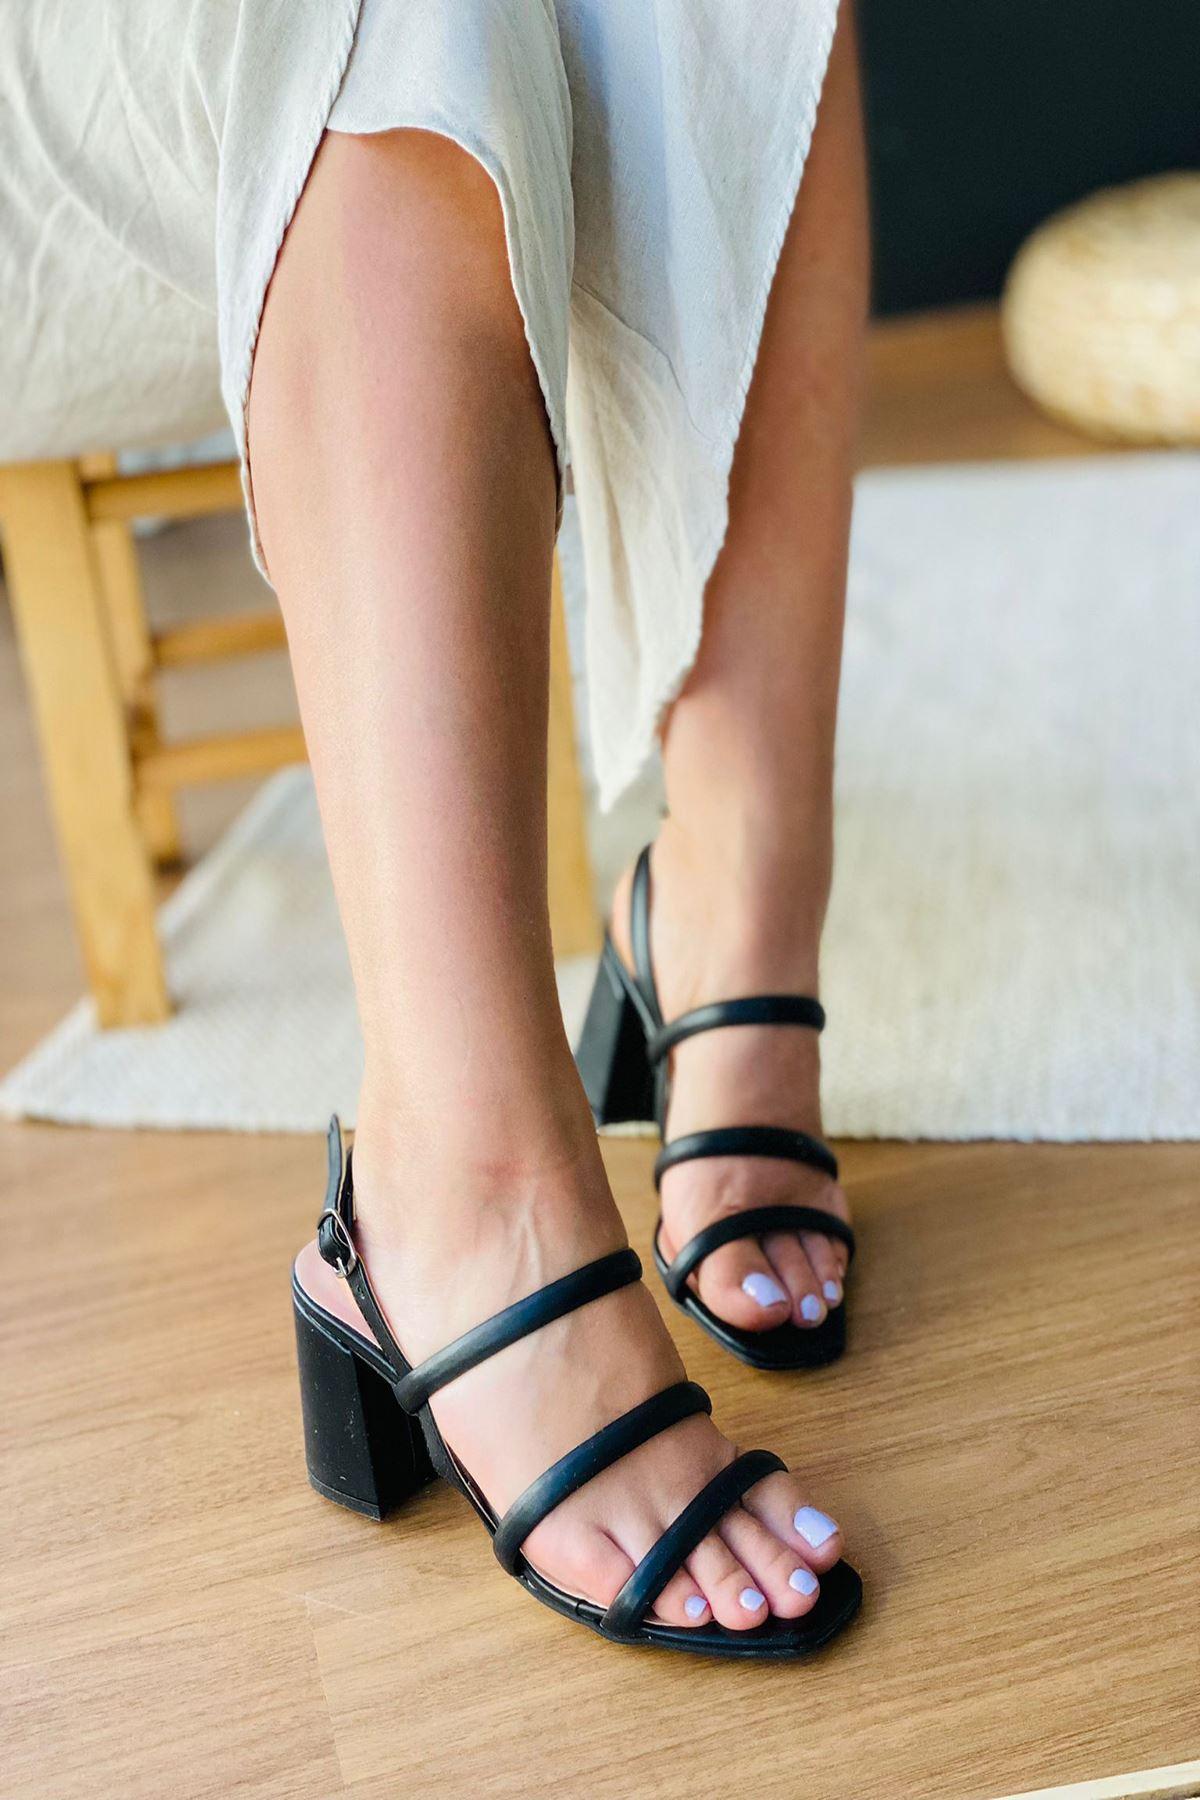 Y3011 Siyah Deri Topuklu Ayakkabı